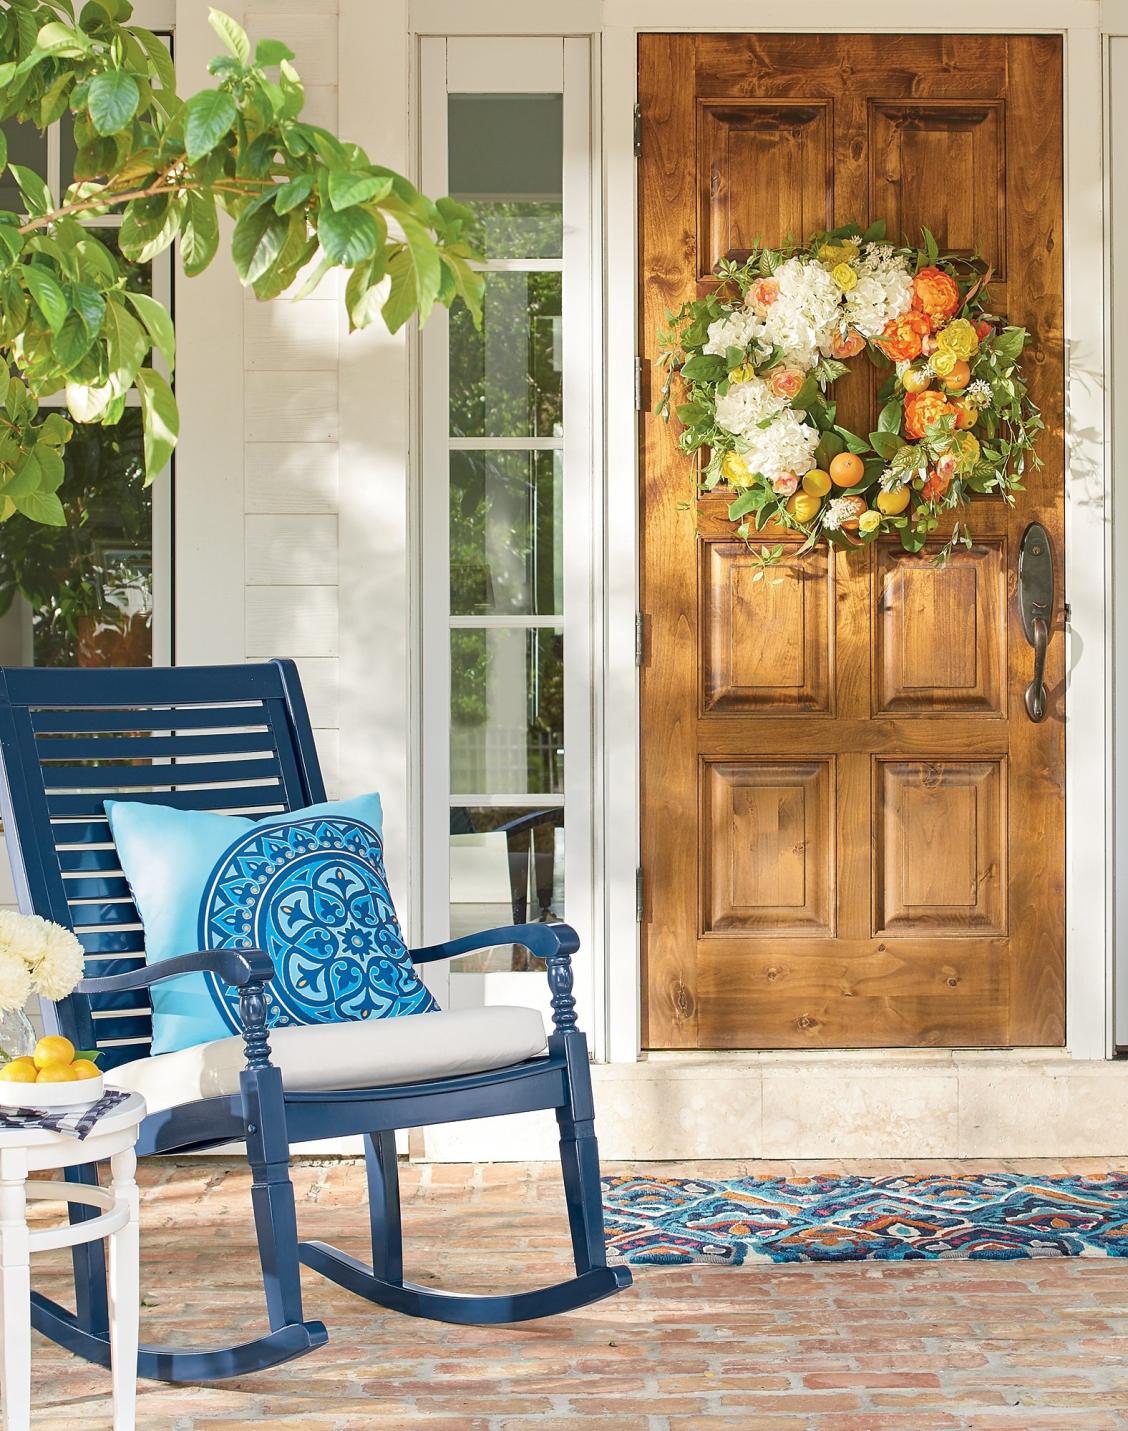 Maison Super Belle nantucket rocking chair in 2018 | wreaths or hanging arrangements